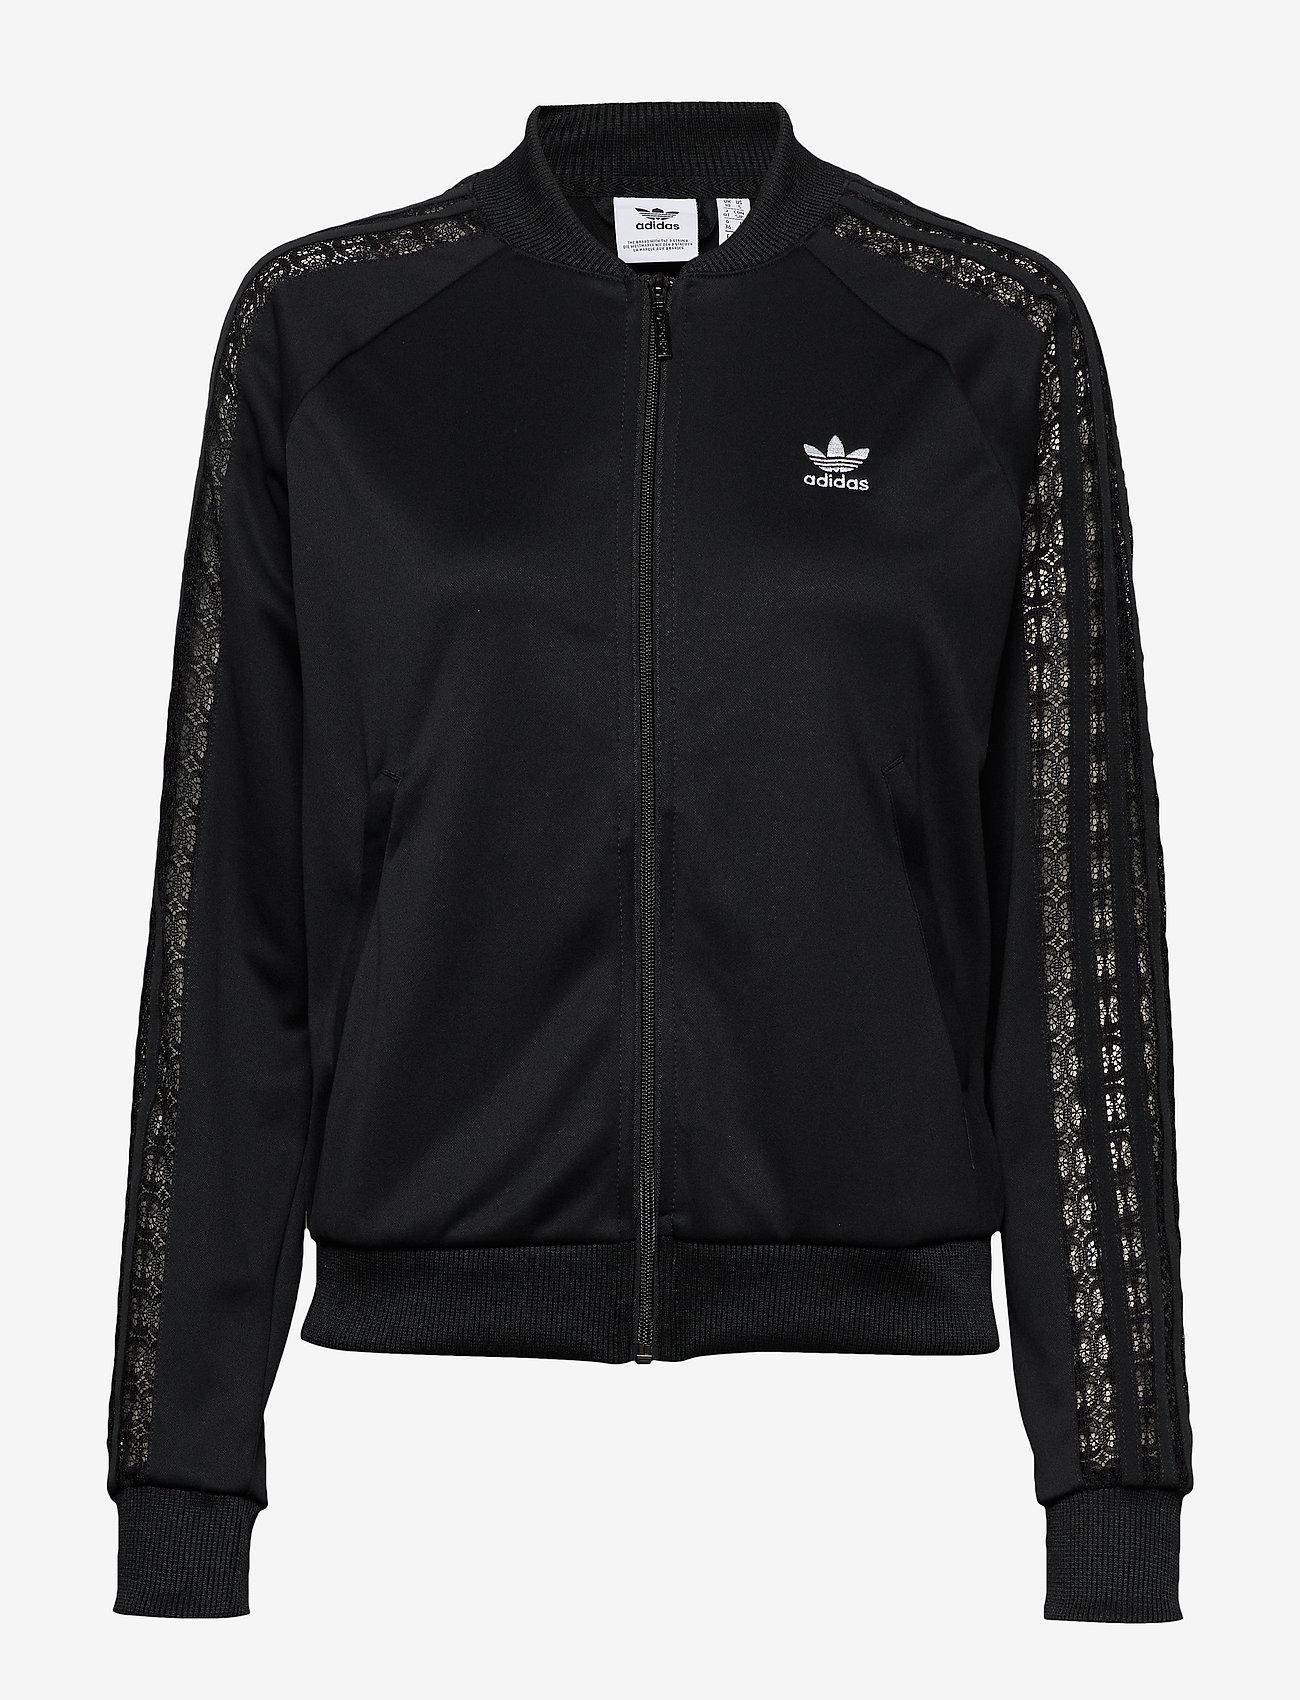 Tracktop (Black) - adidas Originals TEfJMv